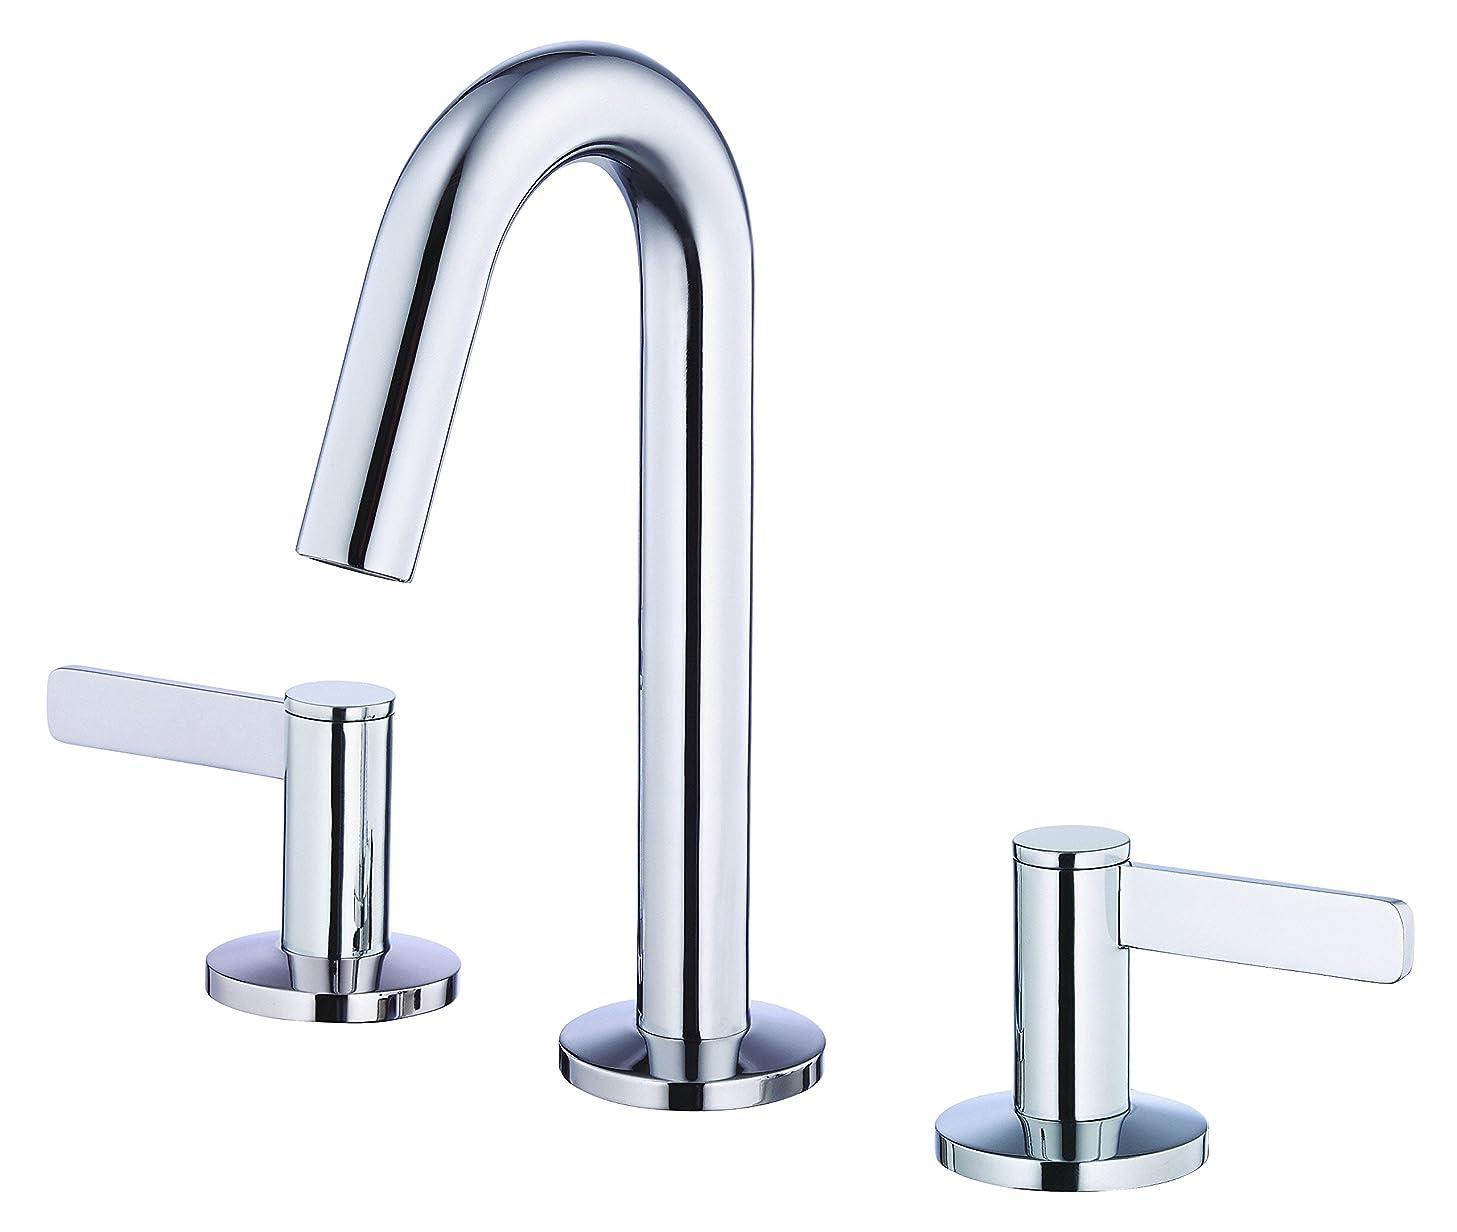 Danze D304130 Amalfi Two Handle Mini-Widespread Lavatory Faucet, Chrome